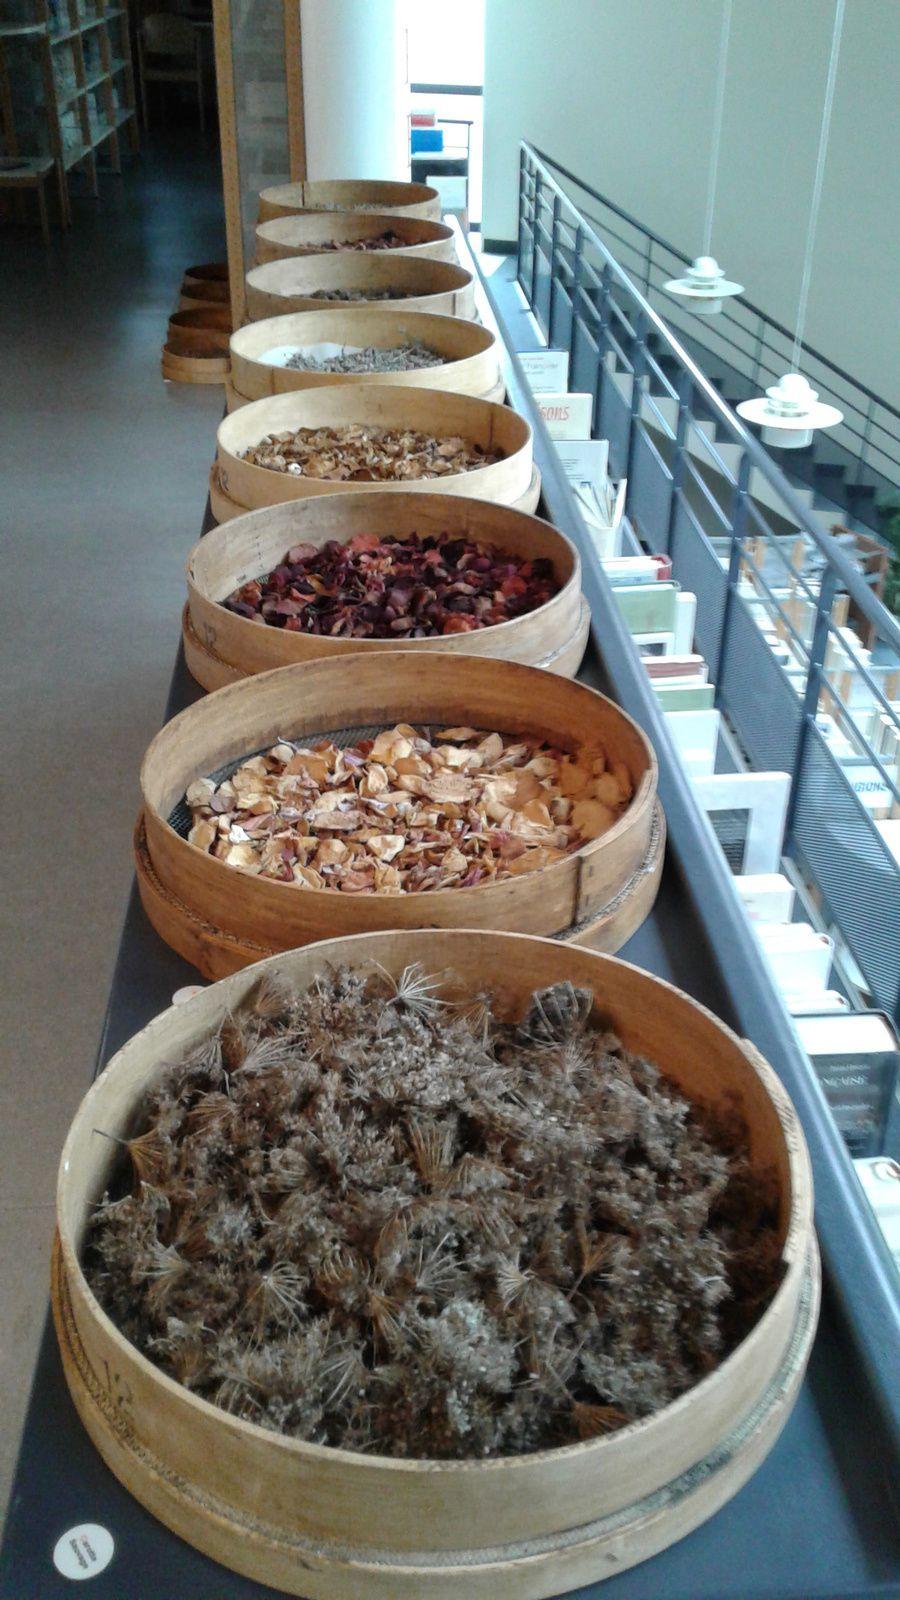 Jardin sensoriel, l'odorat à la Médiathèque Lillebonne  - Caux Vallée de Seine: 120 tamis installés